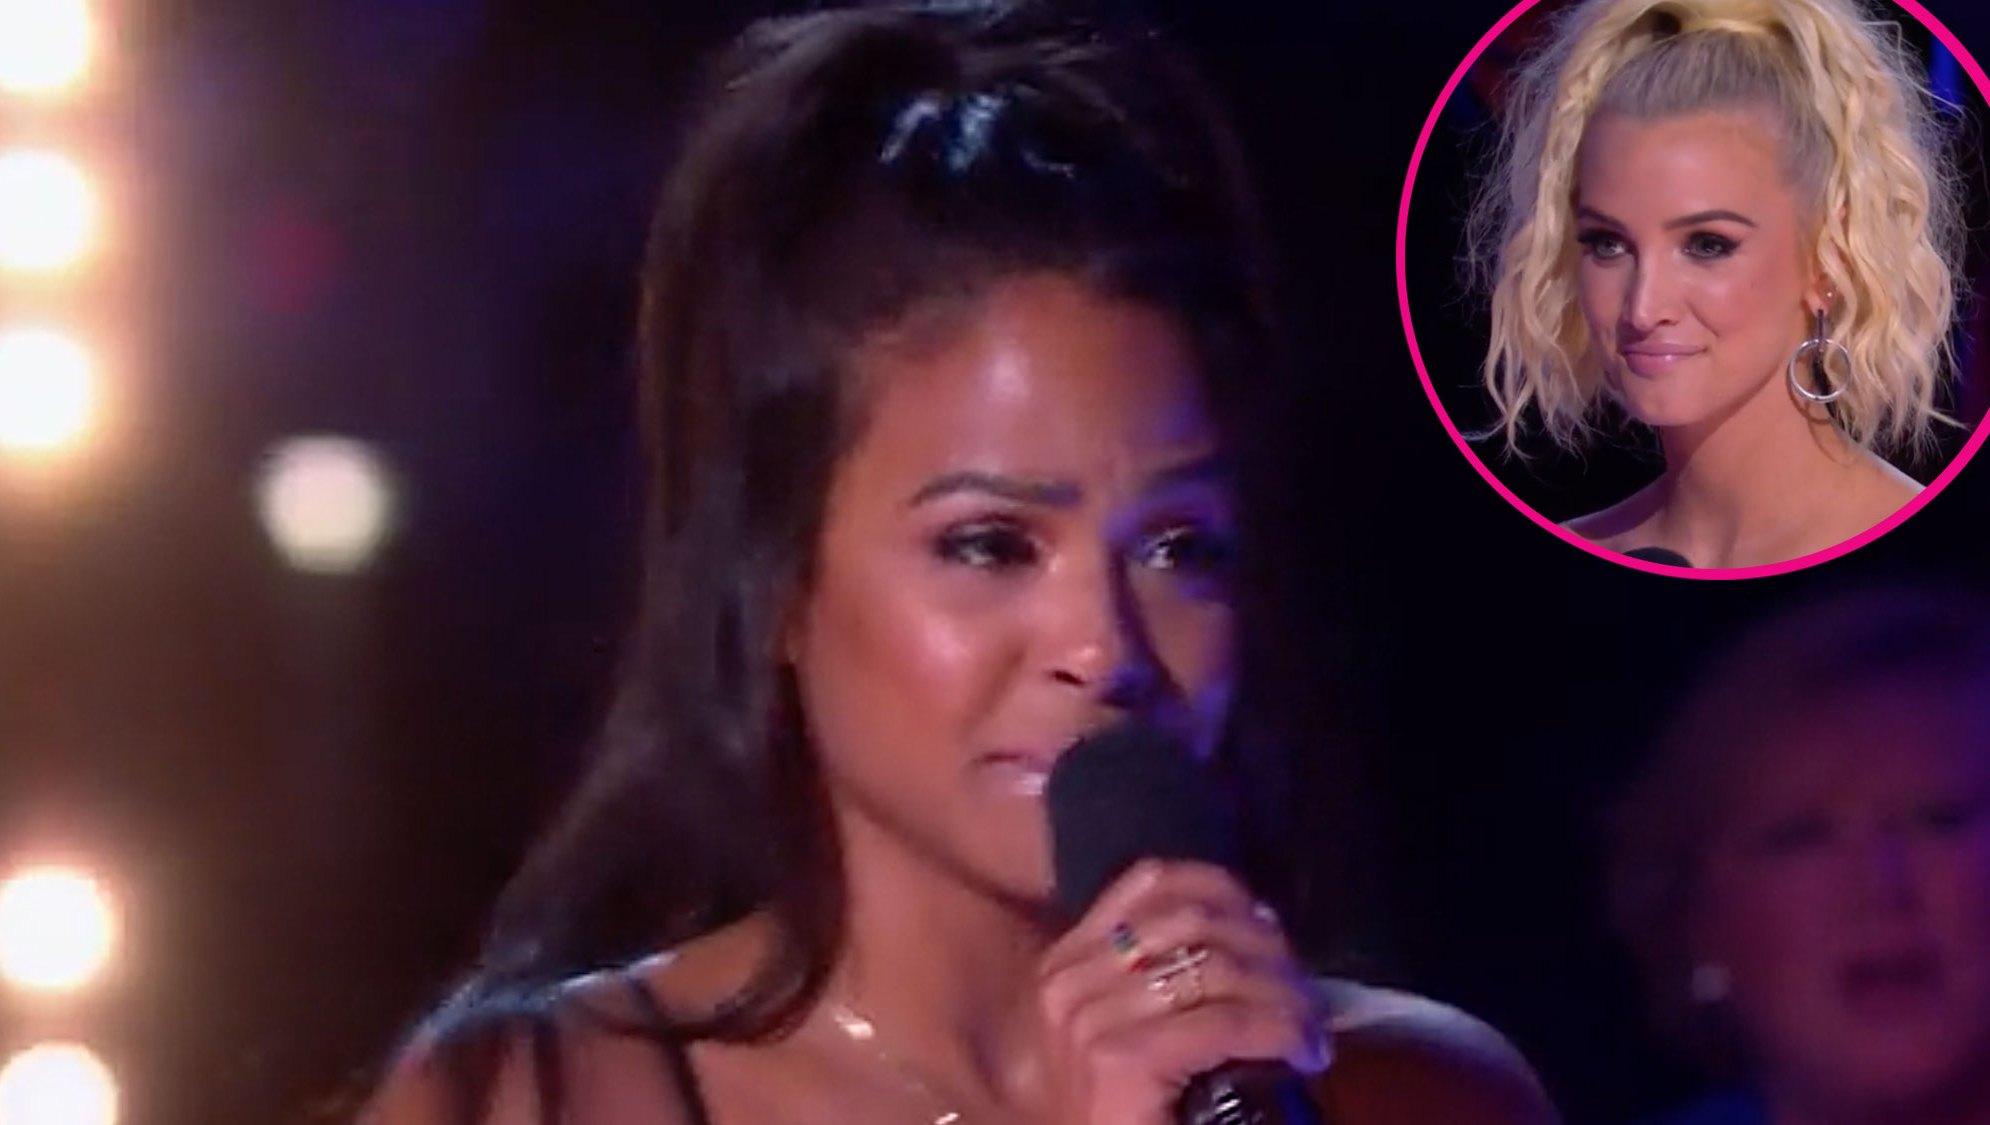 Christina Milian Slams Ashlee Simpson's Reality Show With Husband evan ross